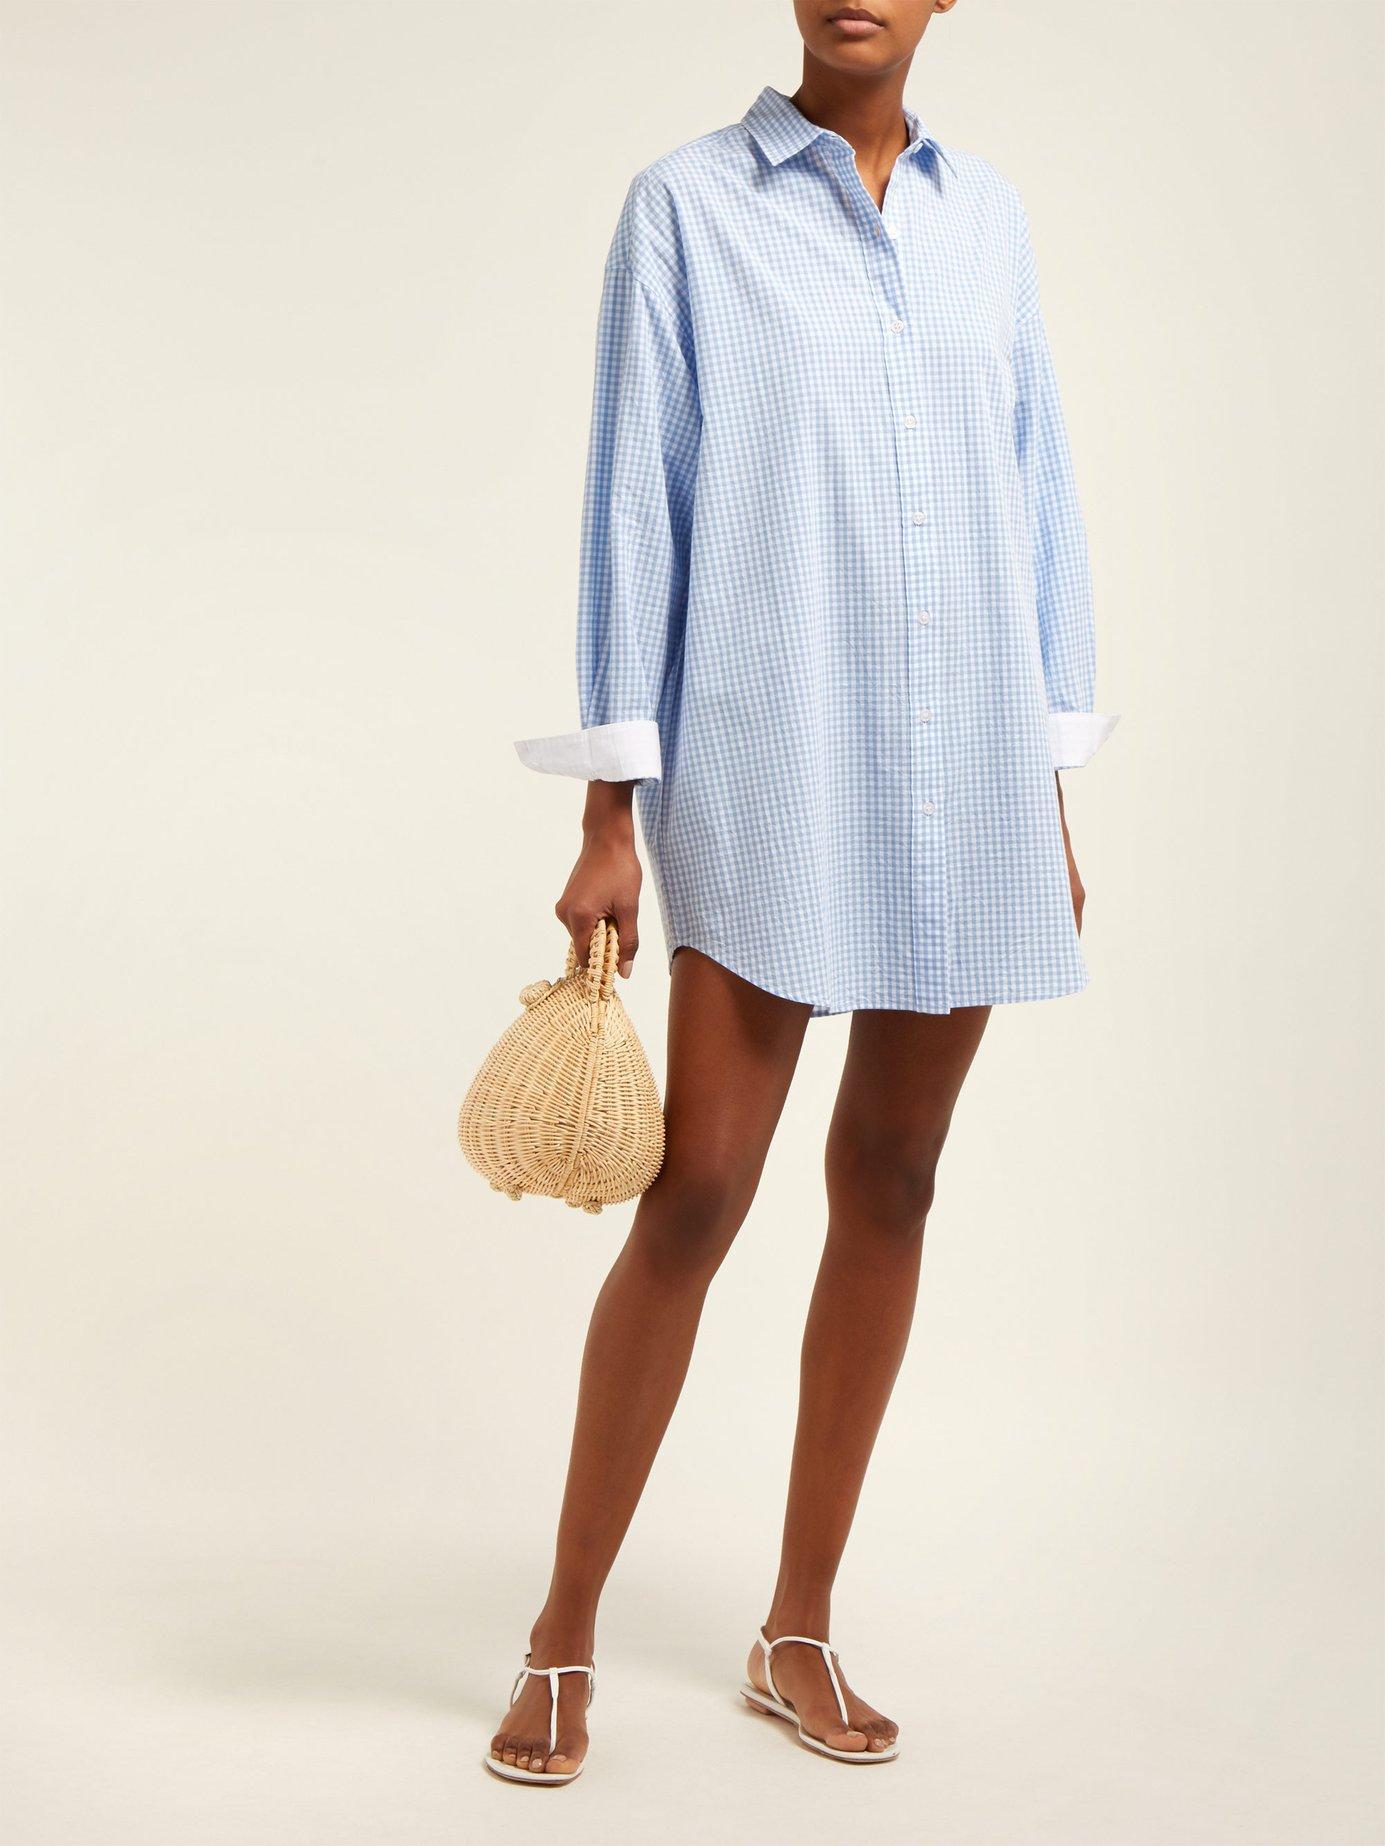 19dd5e3fd63 Mes Demoiselles - Blue Checked Oversized Cotton Shirt - Lyst. View  fullscreen